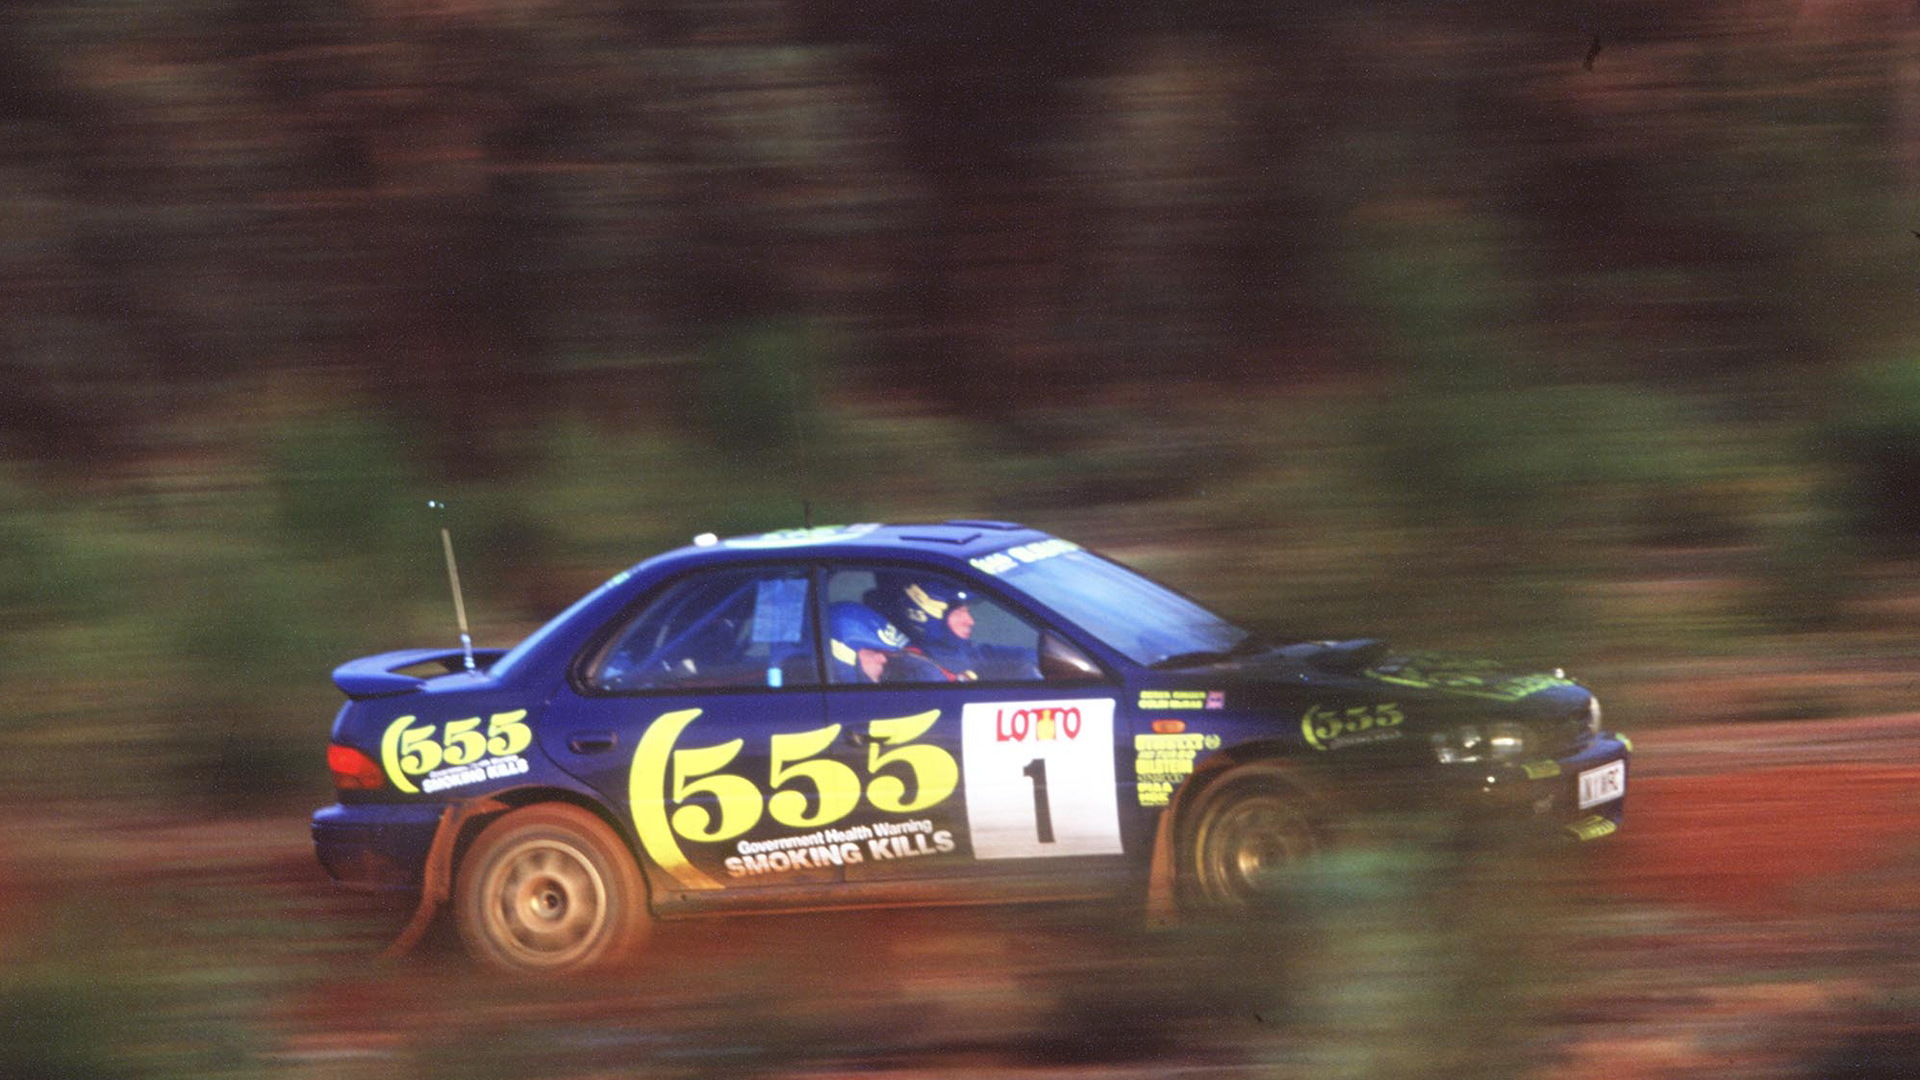 Colin McRae drives a Subaru Impreza Group A rally car build by Prodrive